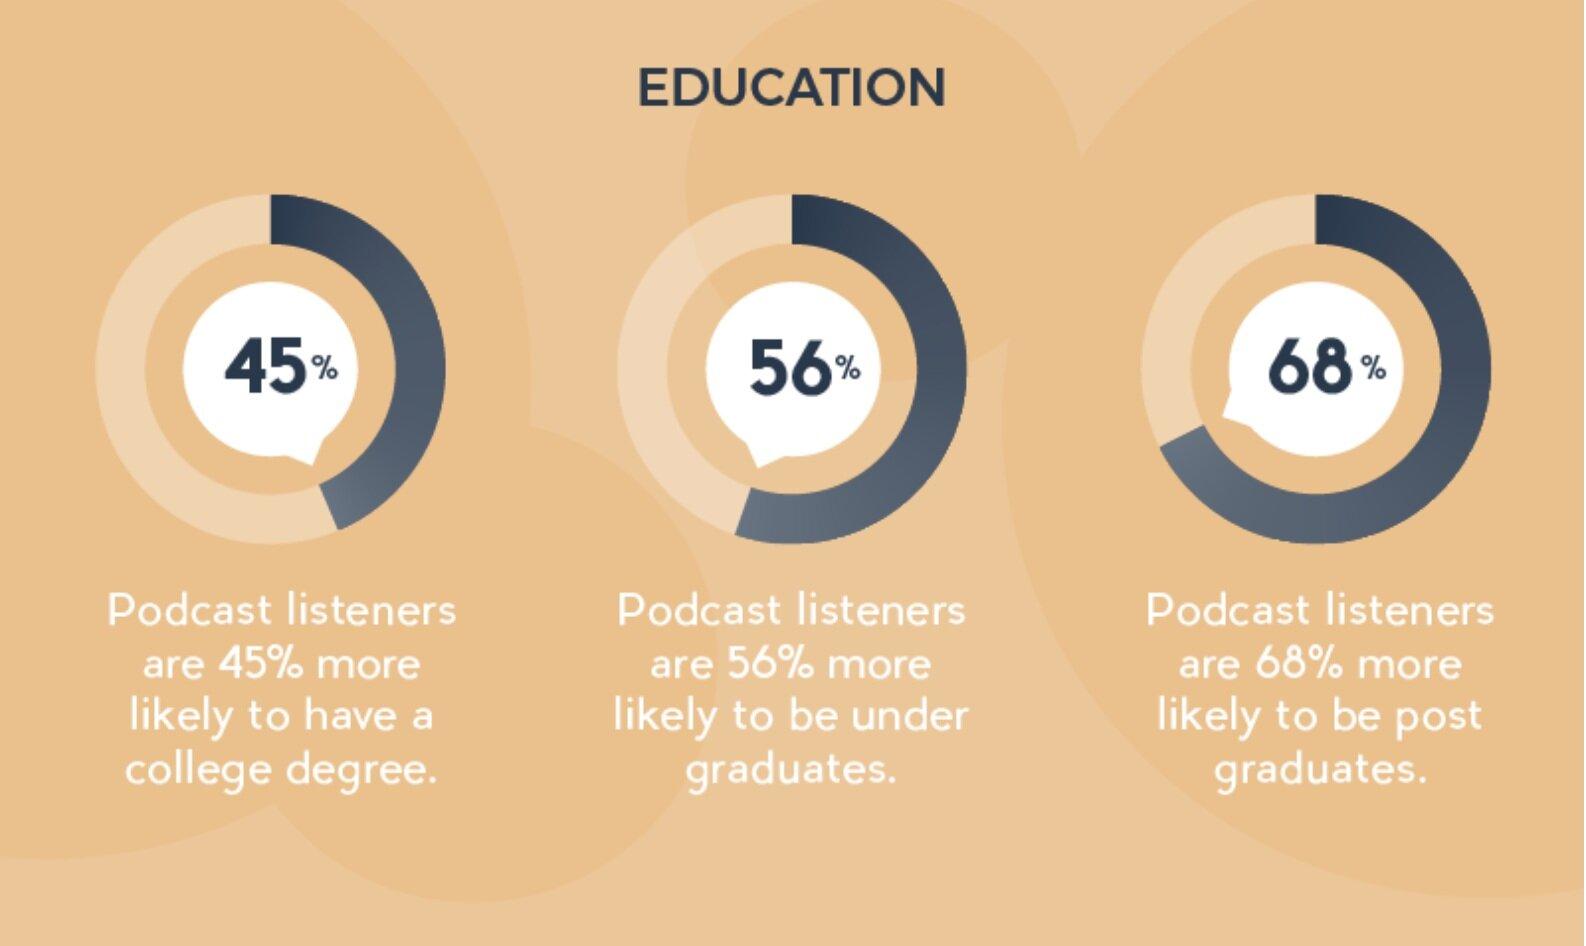 Source: Gavin Whitner  https://musicoomph.com/podcast-statistics/